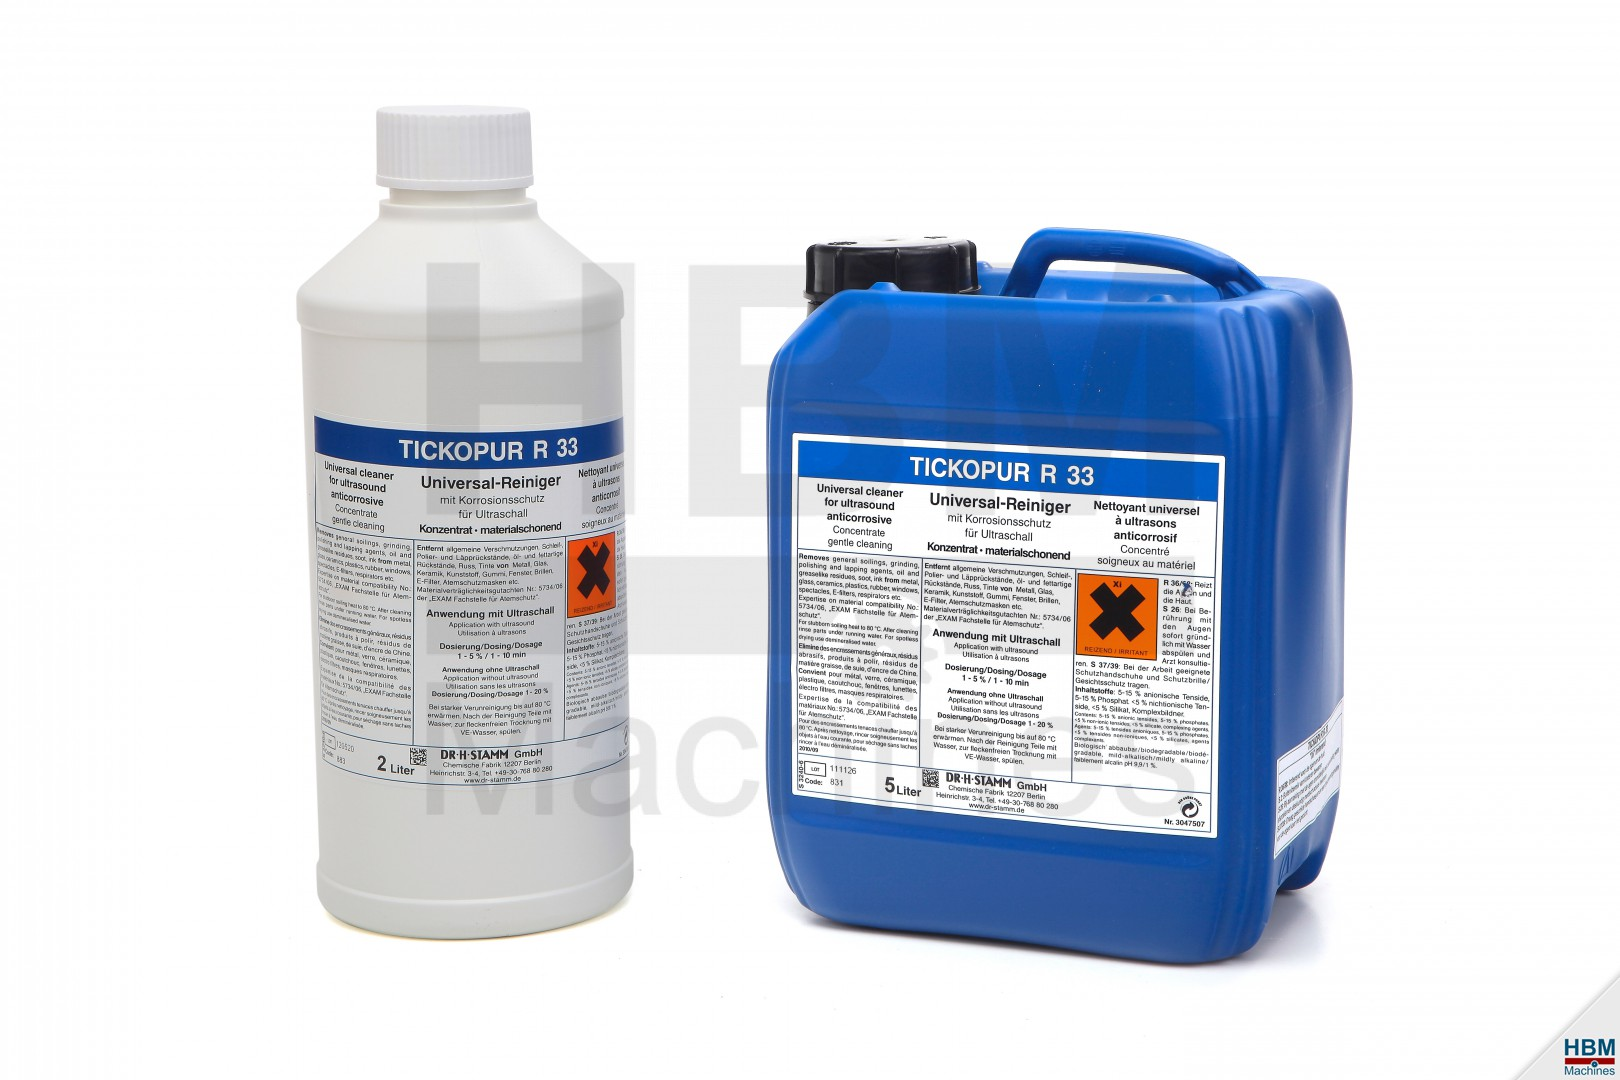 Tickopur r33 reinigingsvloeistof